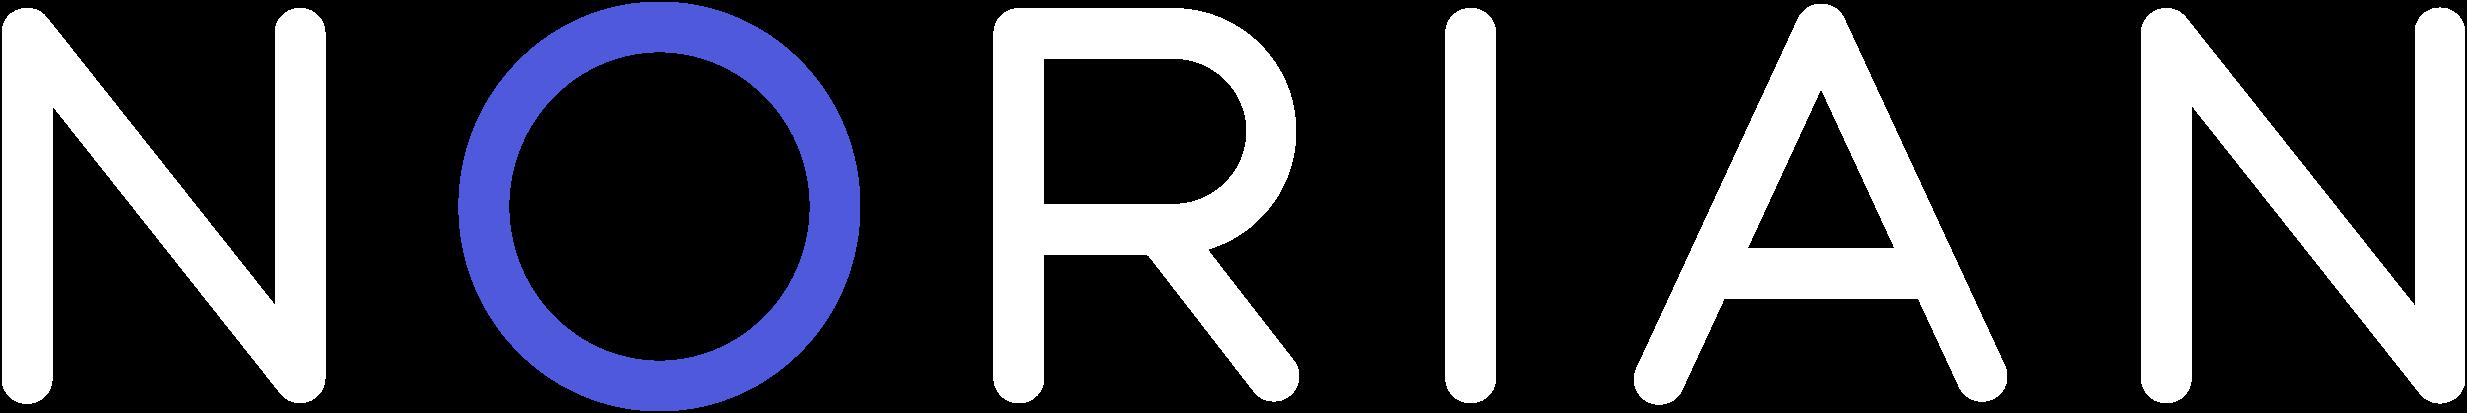 norian_logo